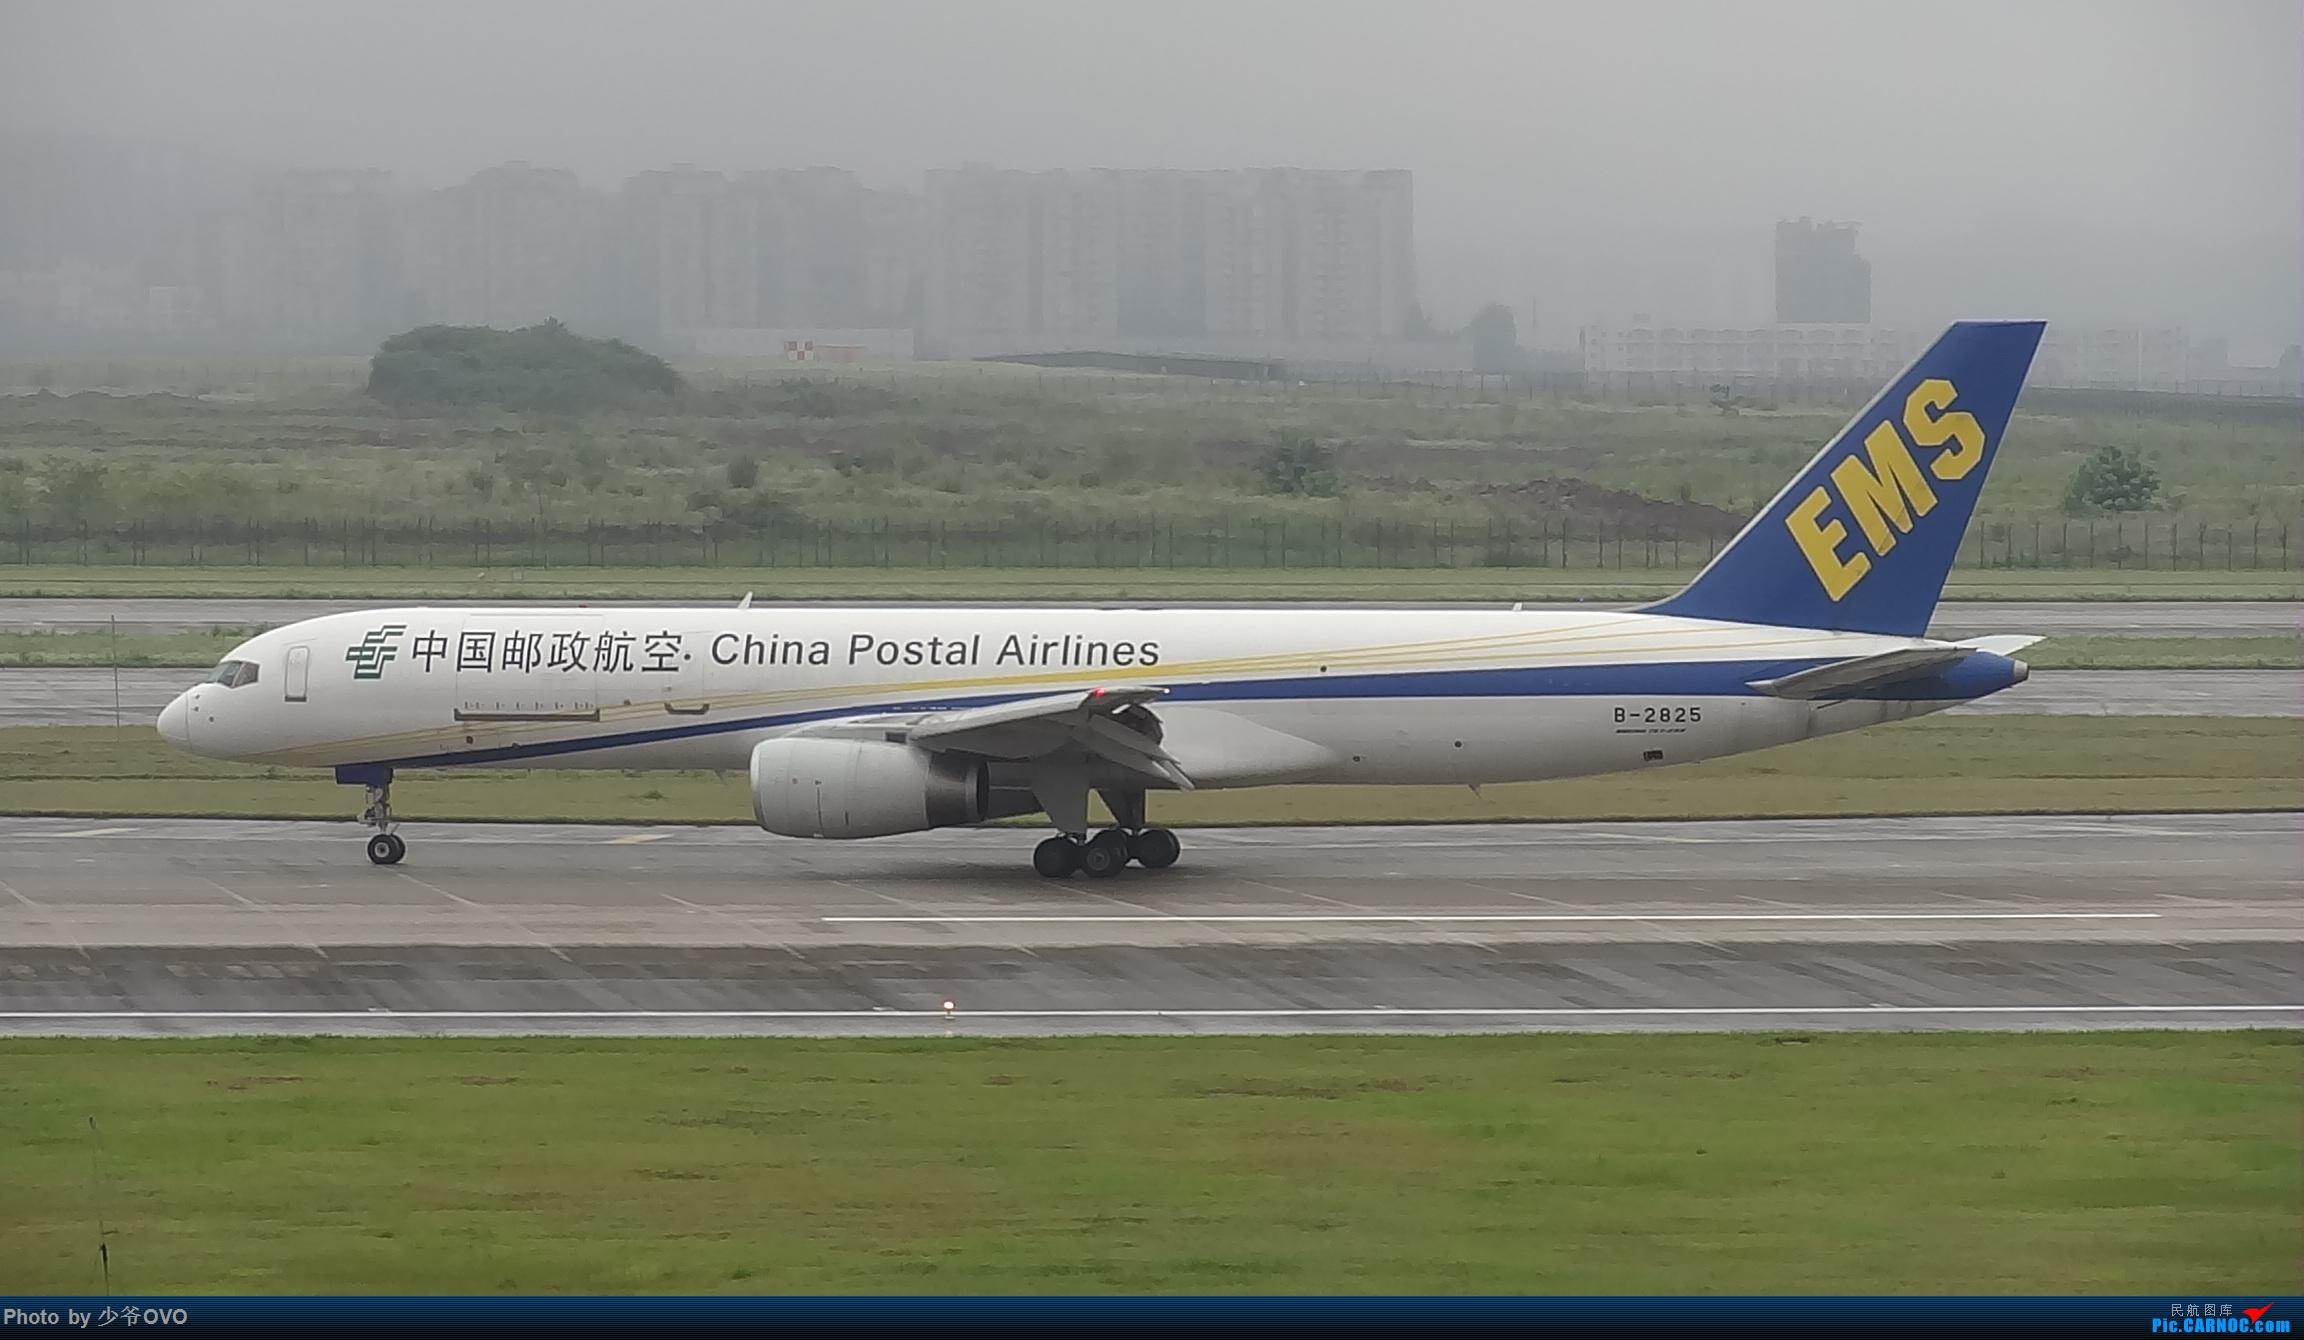 Re:[原创]CKG重庆江北机场拍机 ,中法建交50周年 BOEING 757-200 B-2825 中国重庆江北国际机场